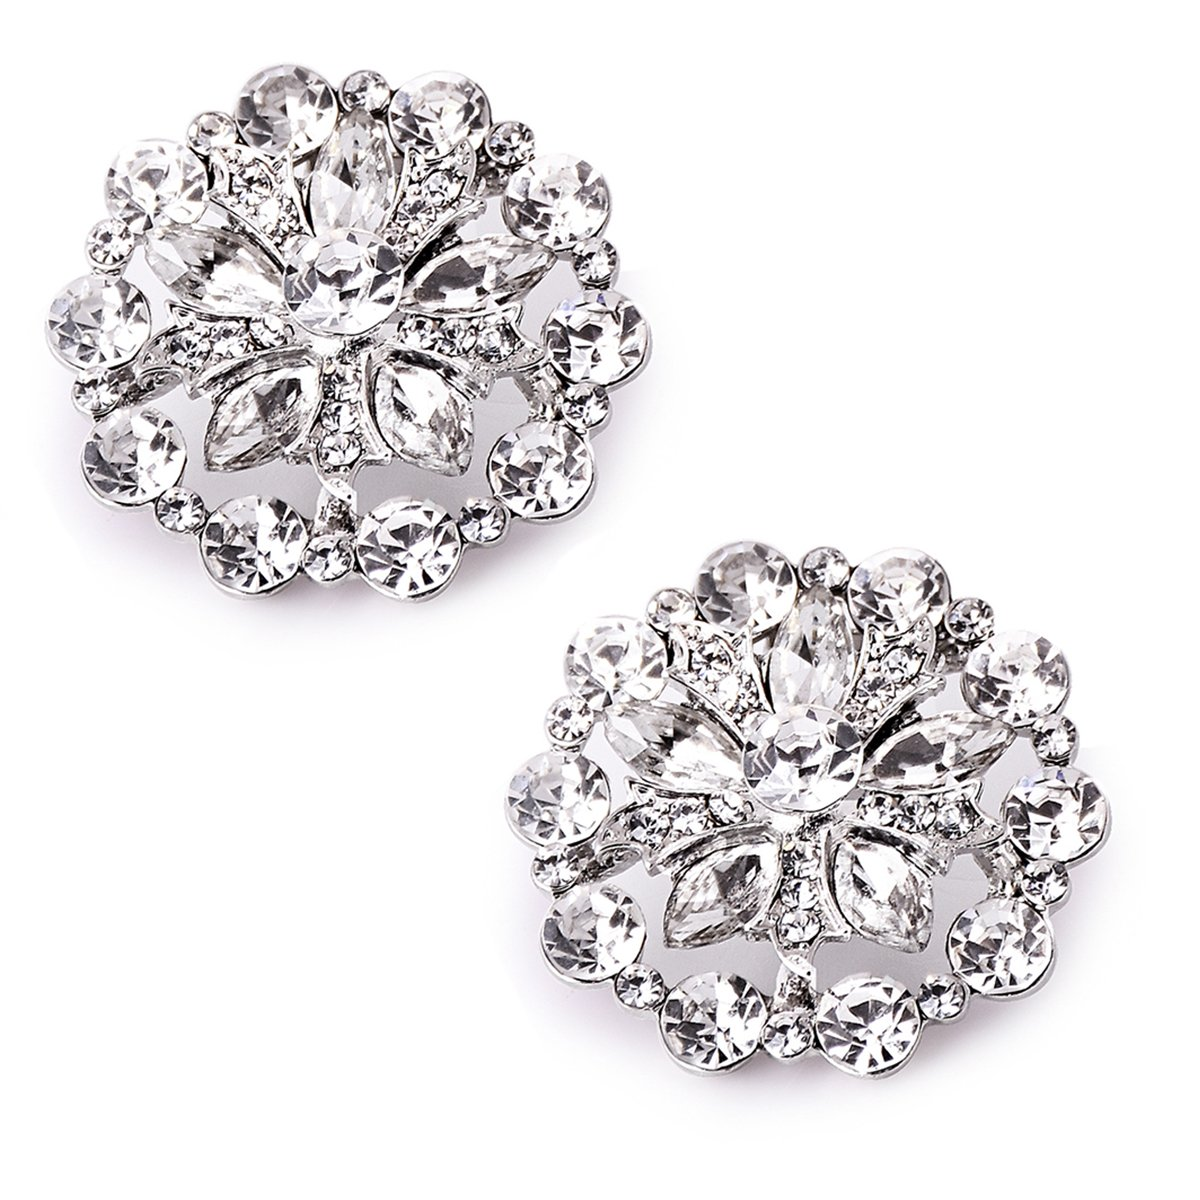 ElegantPark AH01 Fashion Decorative Round Rhinestones Crystal Wedding Party Shoe Clips 2 Pcs Silver